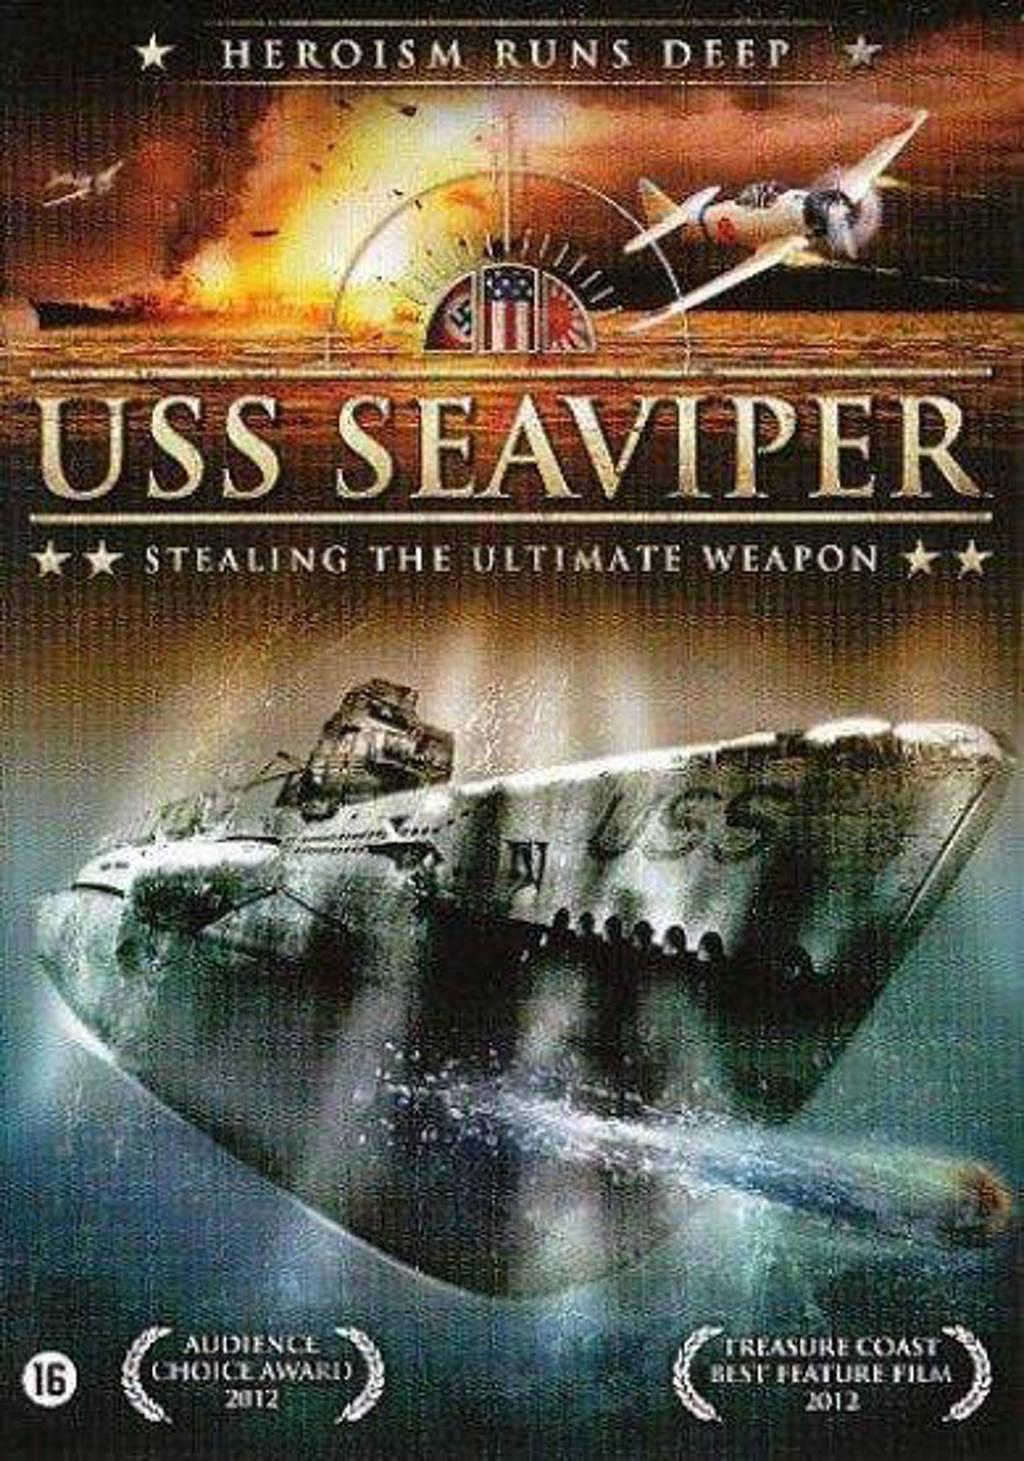 USS seaviper (DVD)